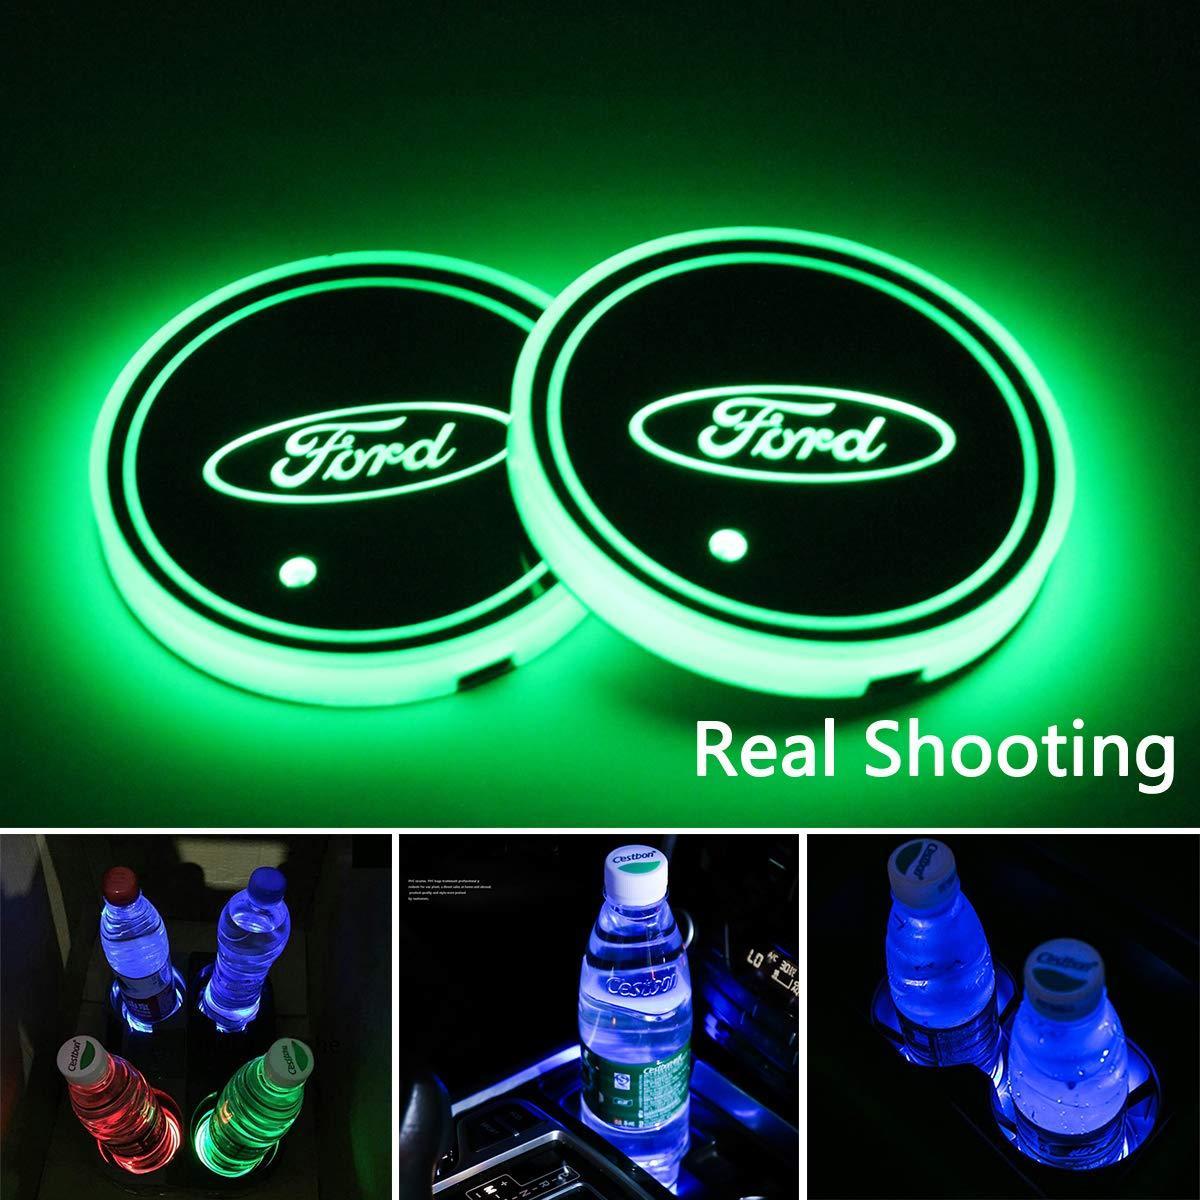 2PCS LED أضواء حامل كأس سيارة لفورد ، 7 ألوان تغيير USB شحن حصيرة سادة كأس الانارة ، مصباح LED جو الداخلية